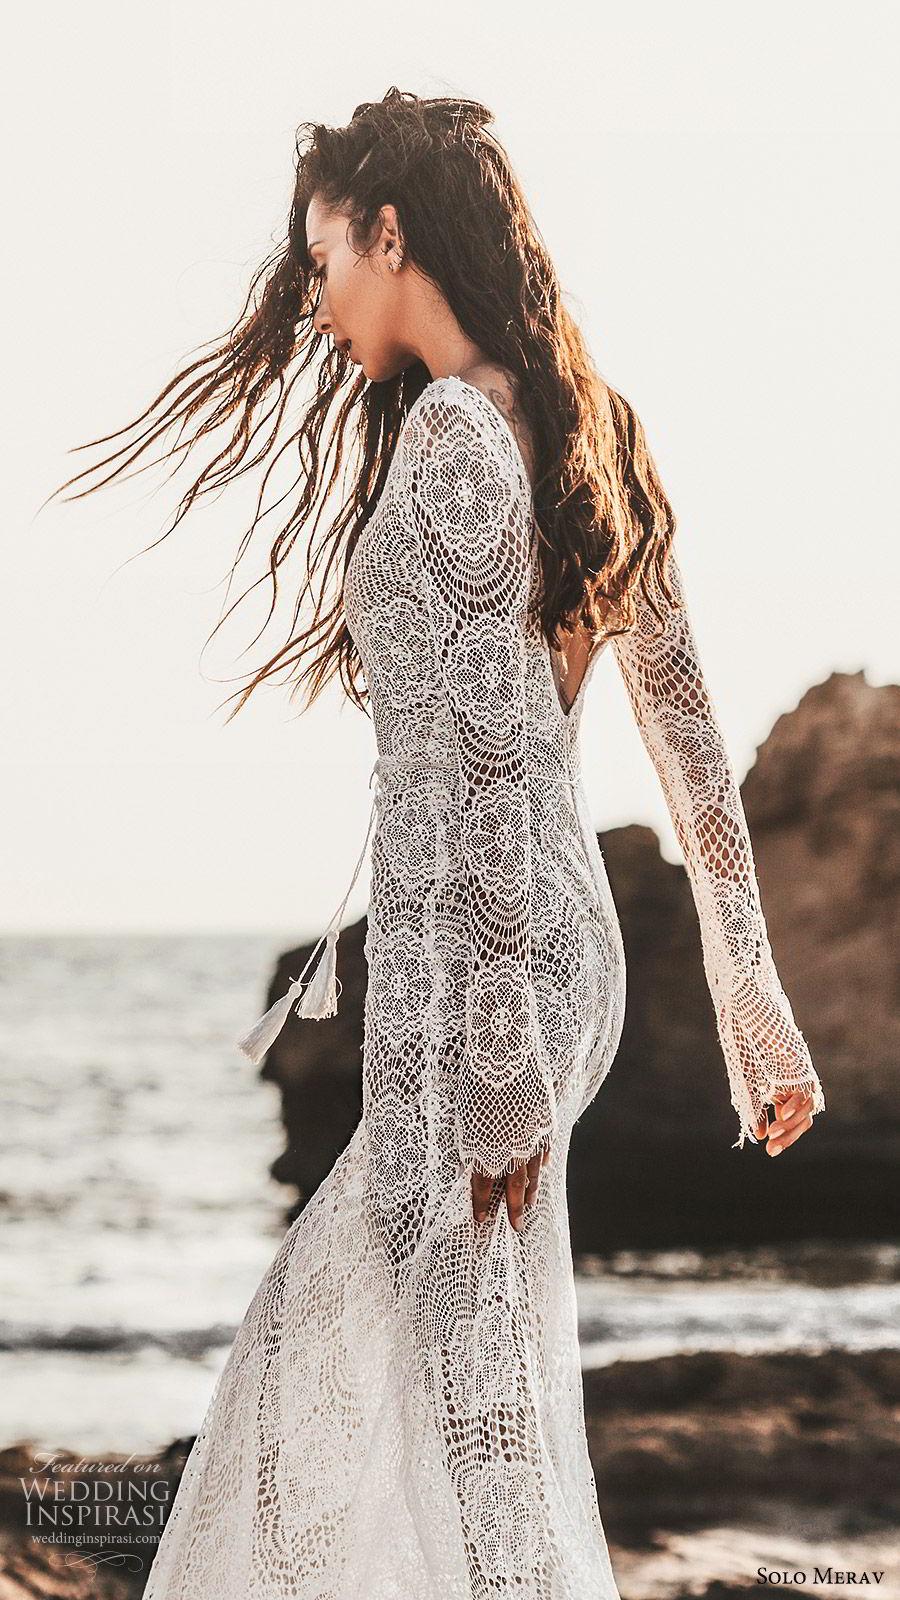 solo merav 2019 bridal long sleeves plunging v neckline sheath lace mermaid wedding dress (1) zbv scoop back sweep train elegant boho romantic